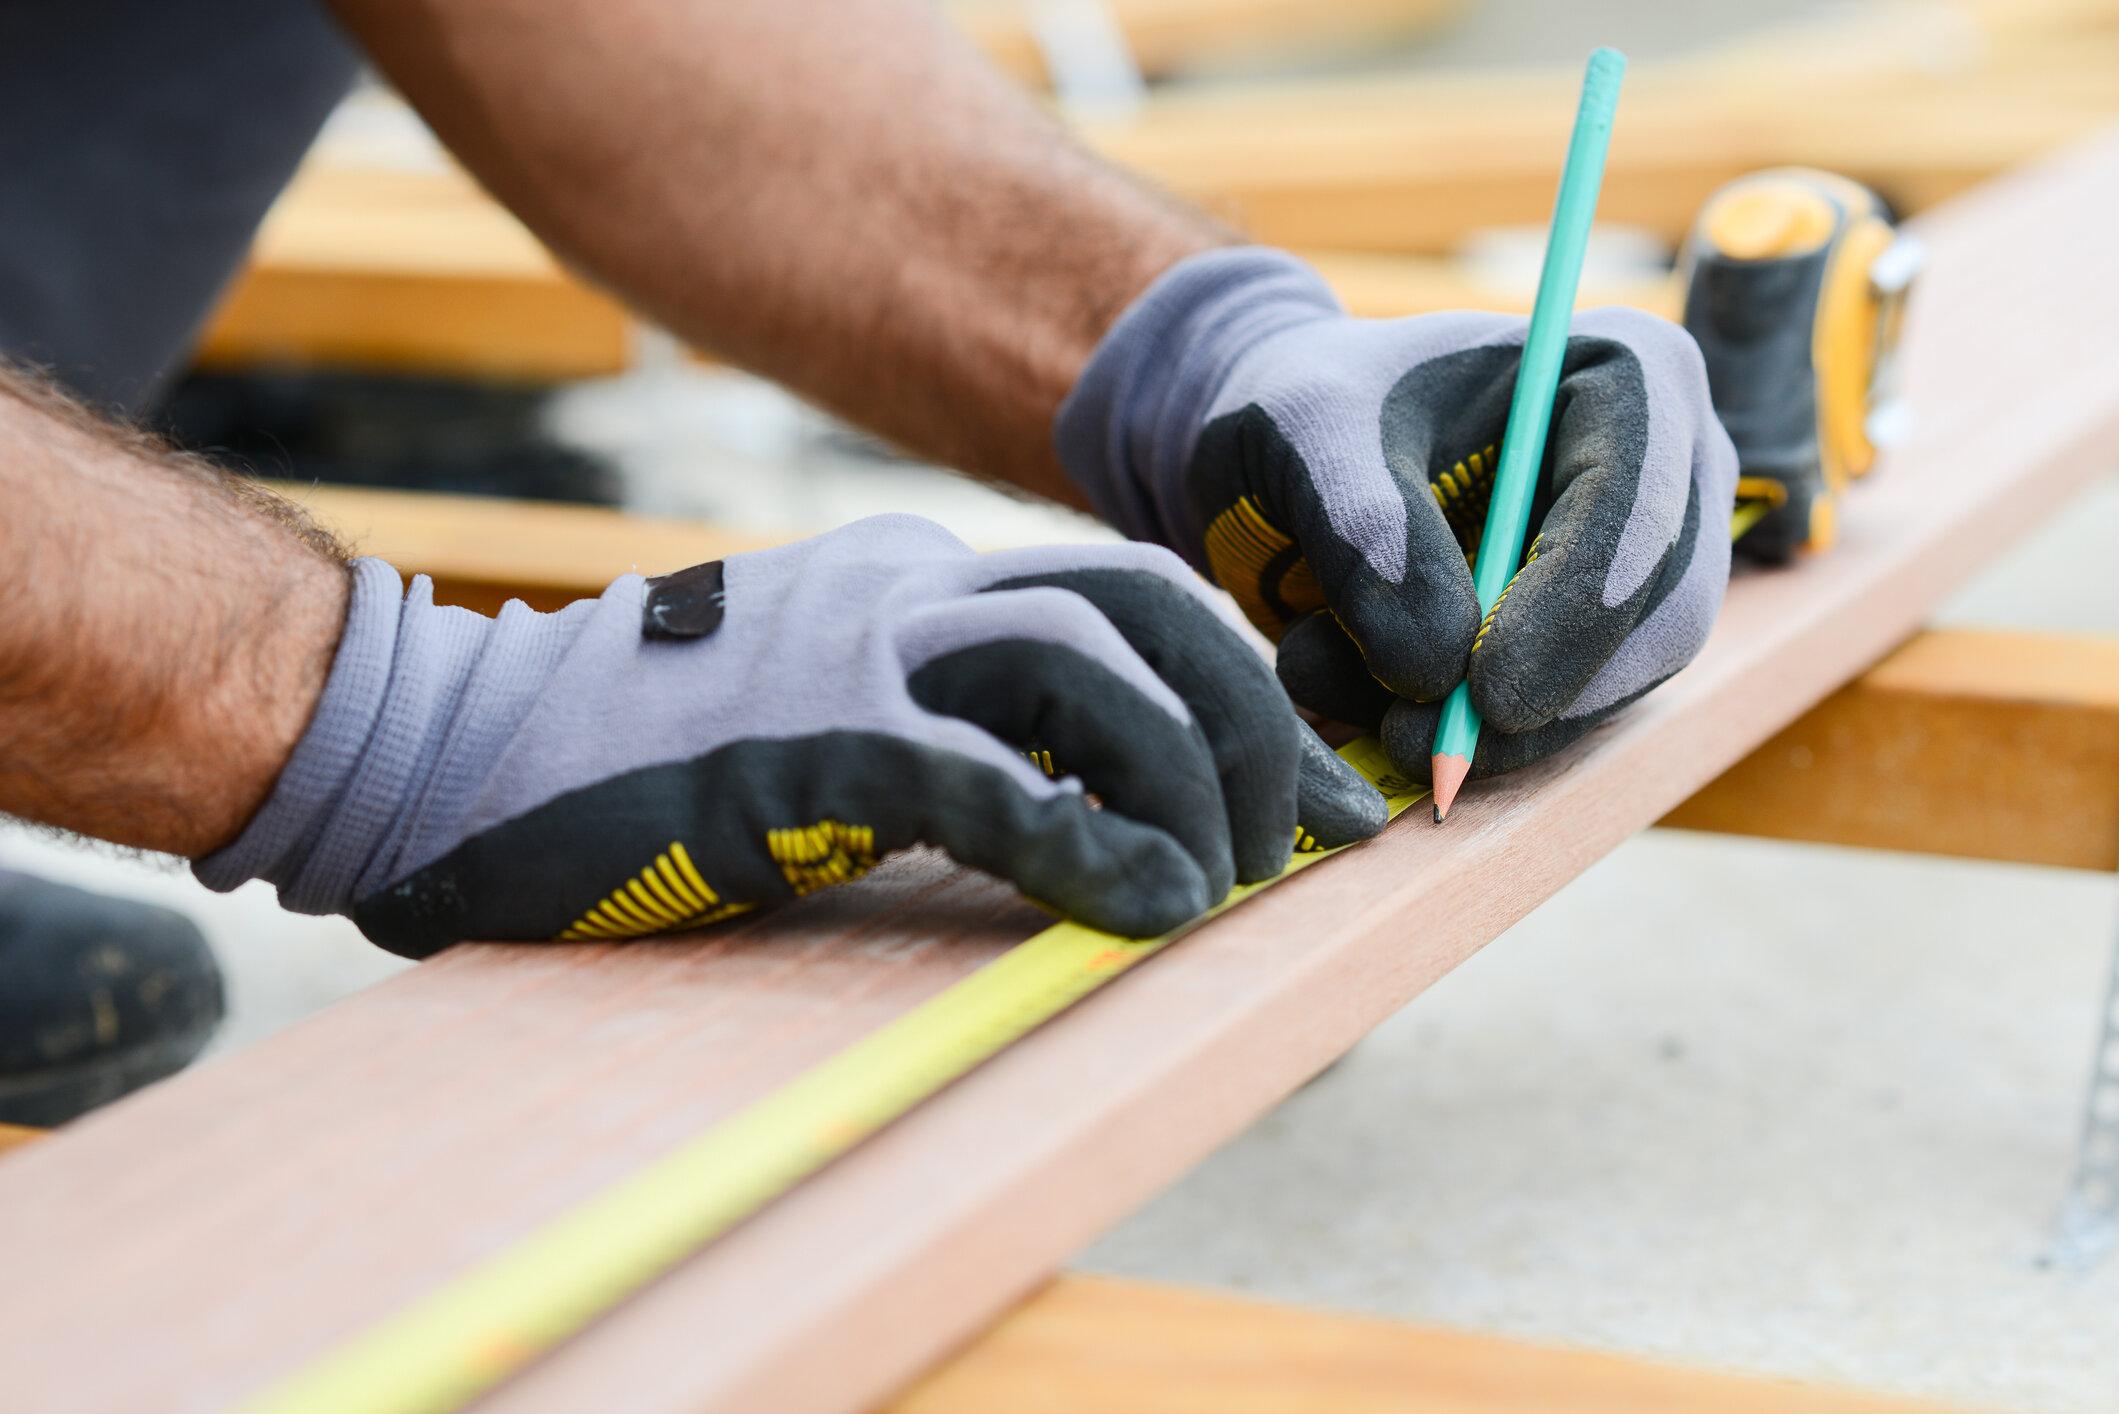 Carpentry_iStock-945467306.jpg